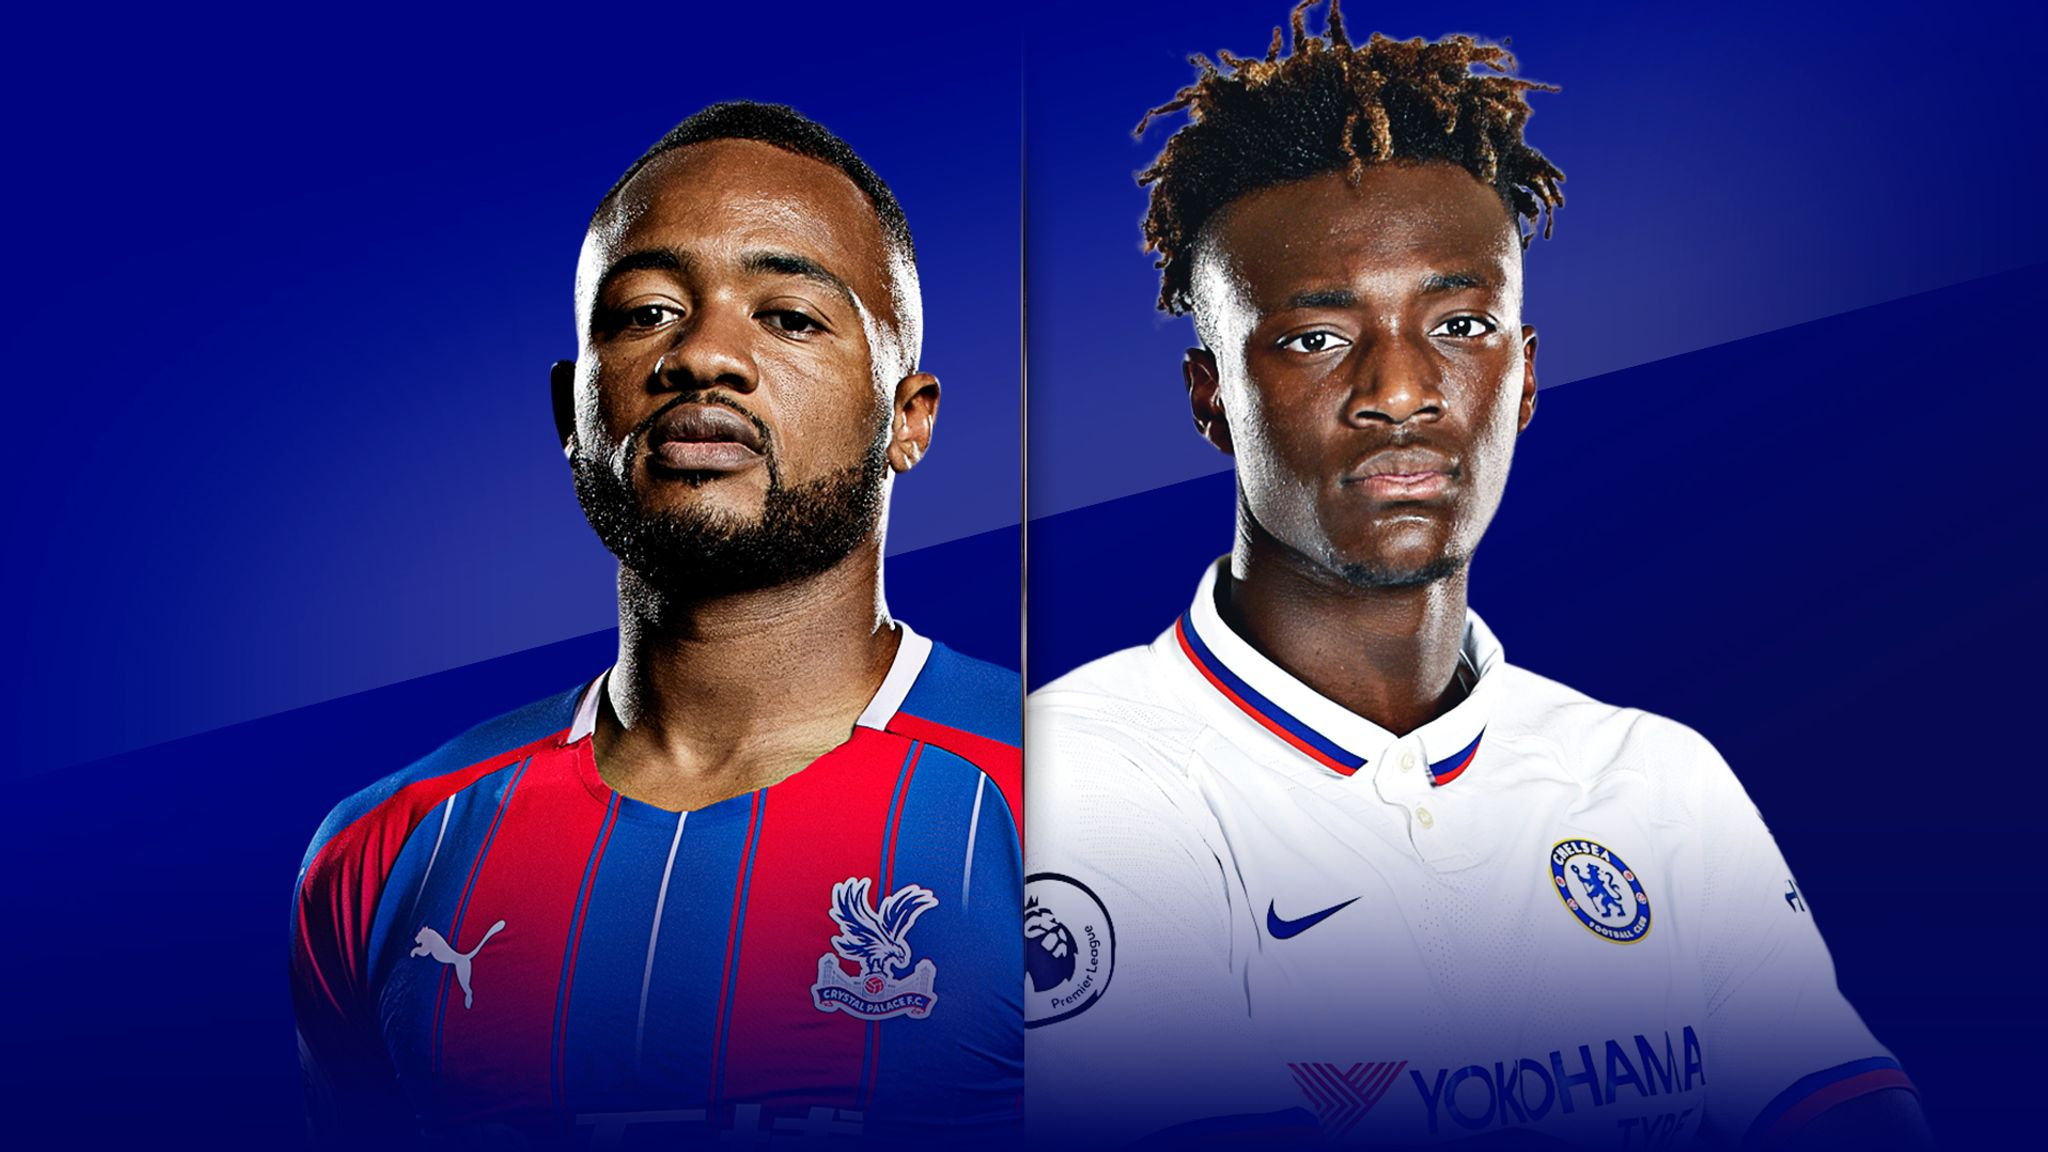 Live Match Preview C Palace Vs Chelsea 07 07 2020